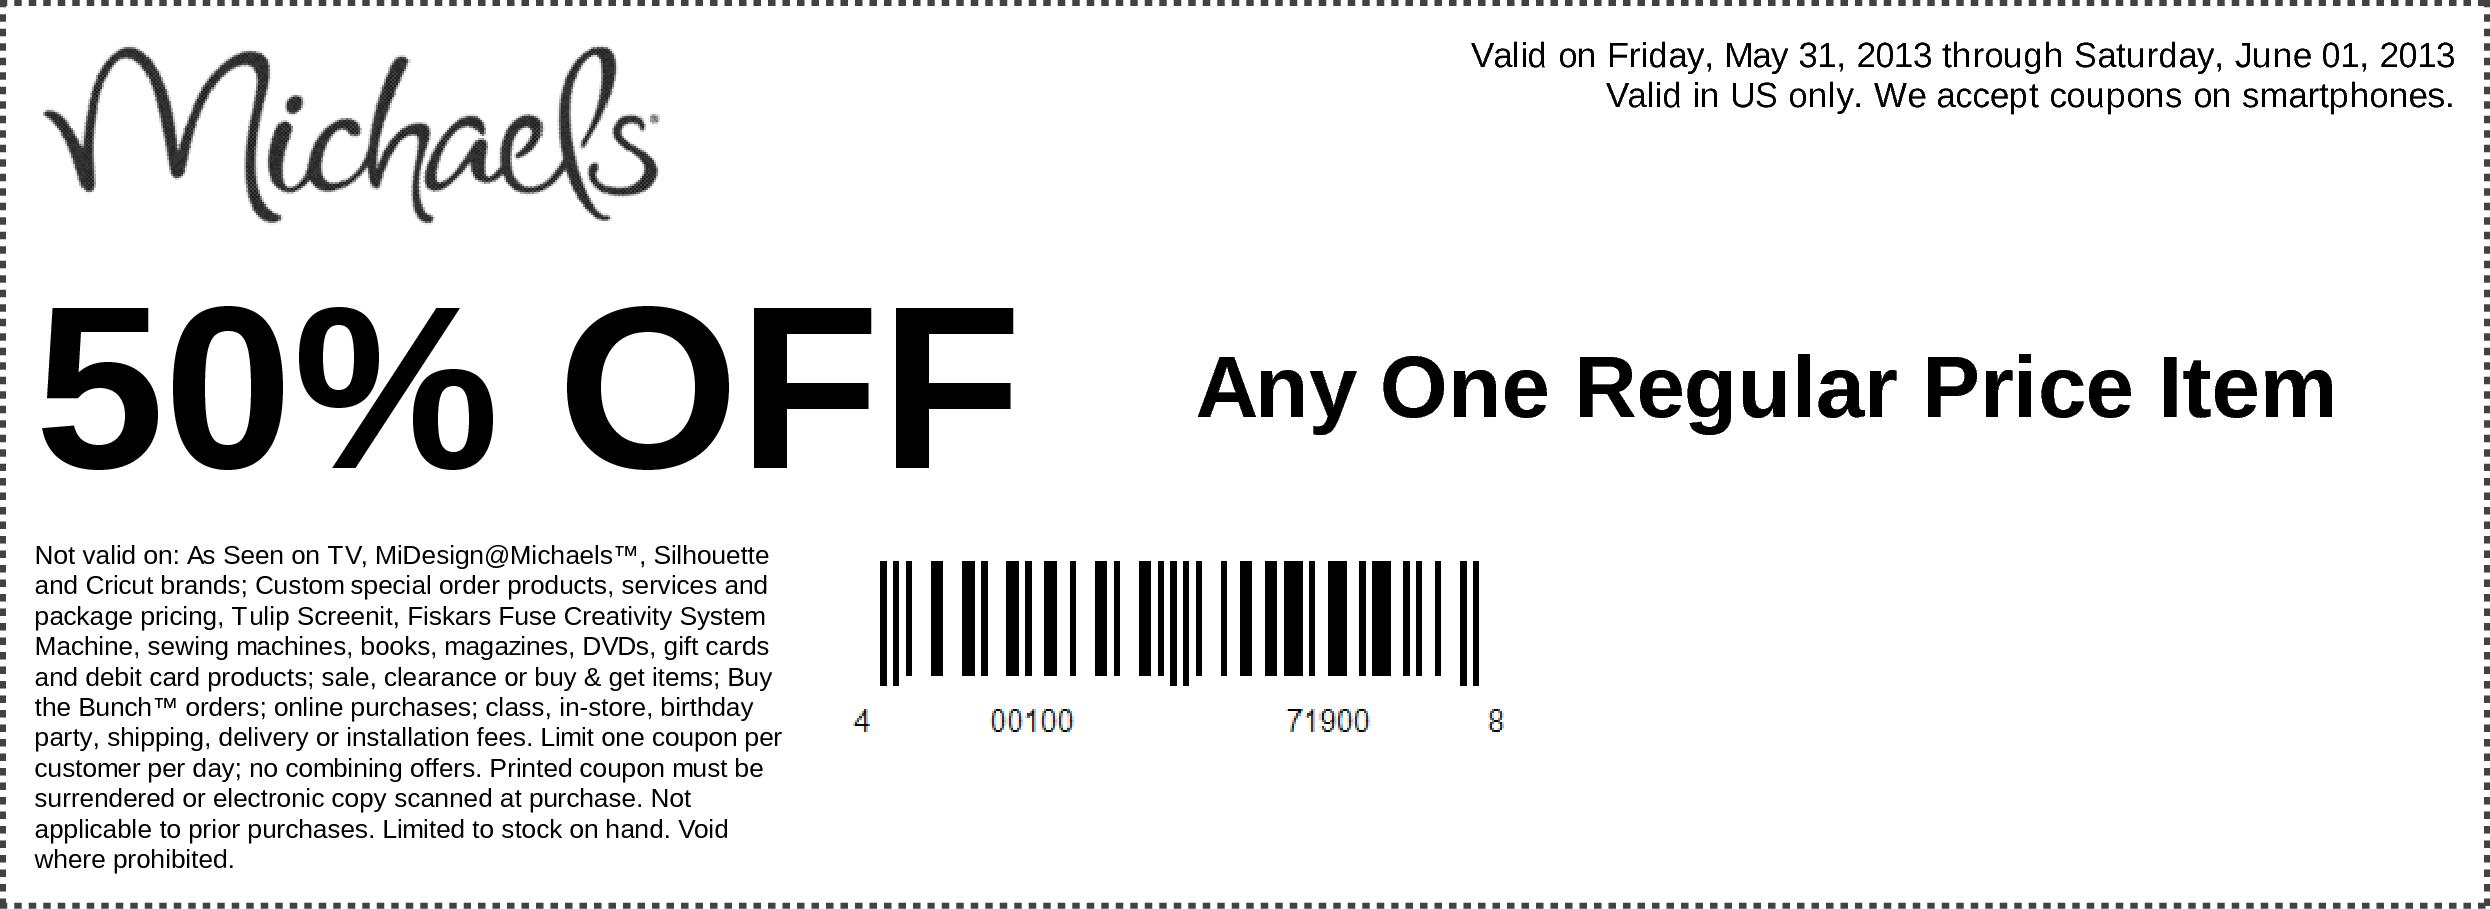 Free-Michaels-Printable-Coupons-2017 – Printable Coupons Online - Free Printable Coupons Victoria Secret